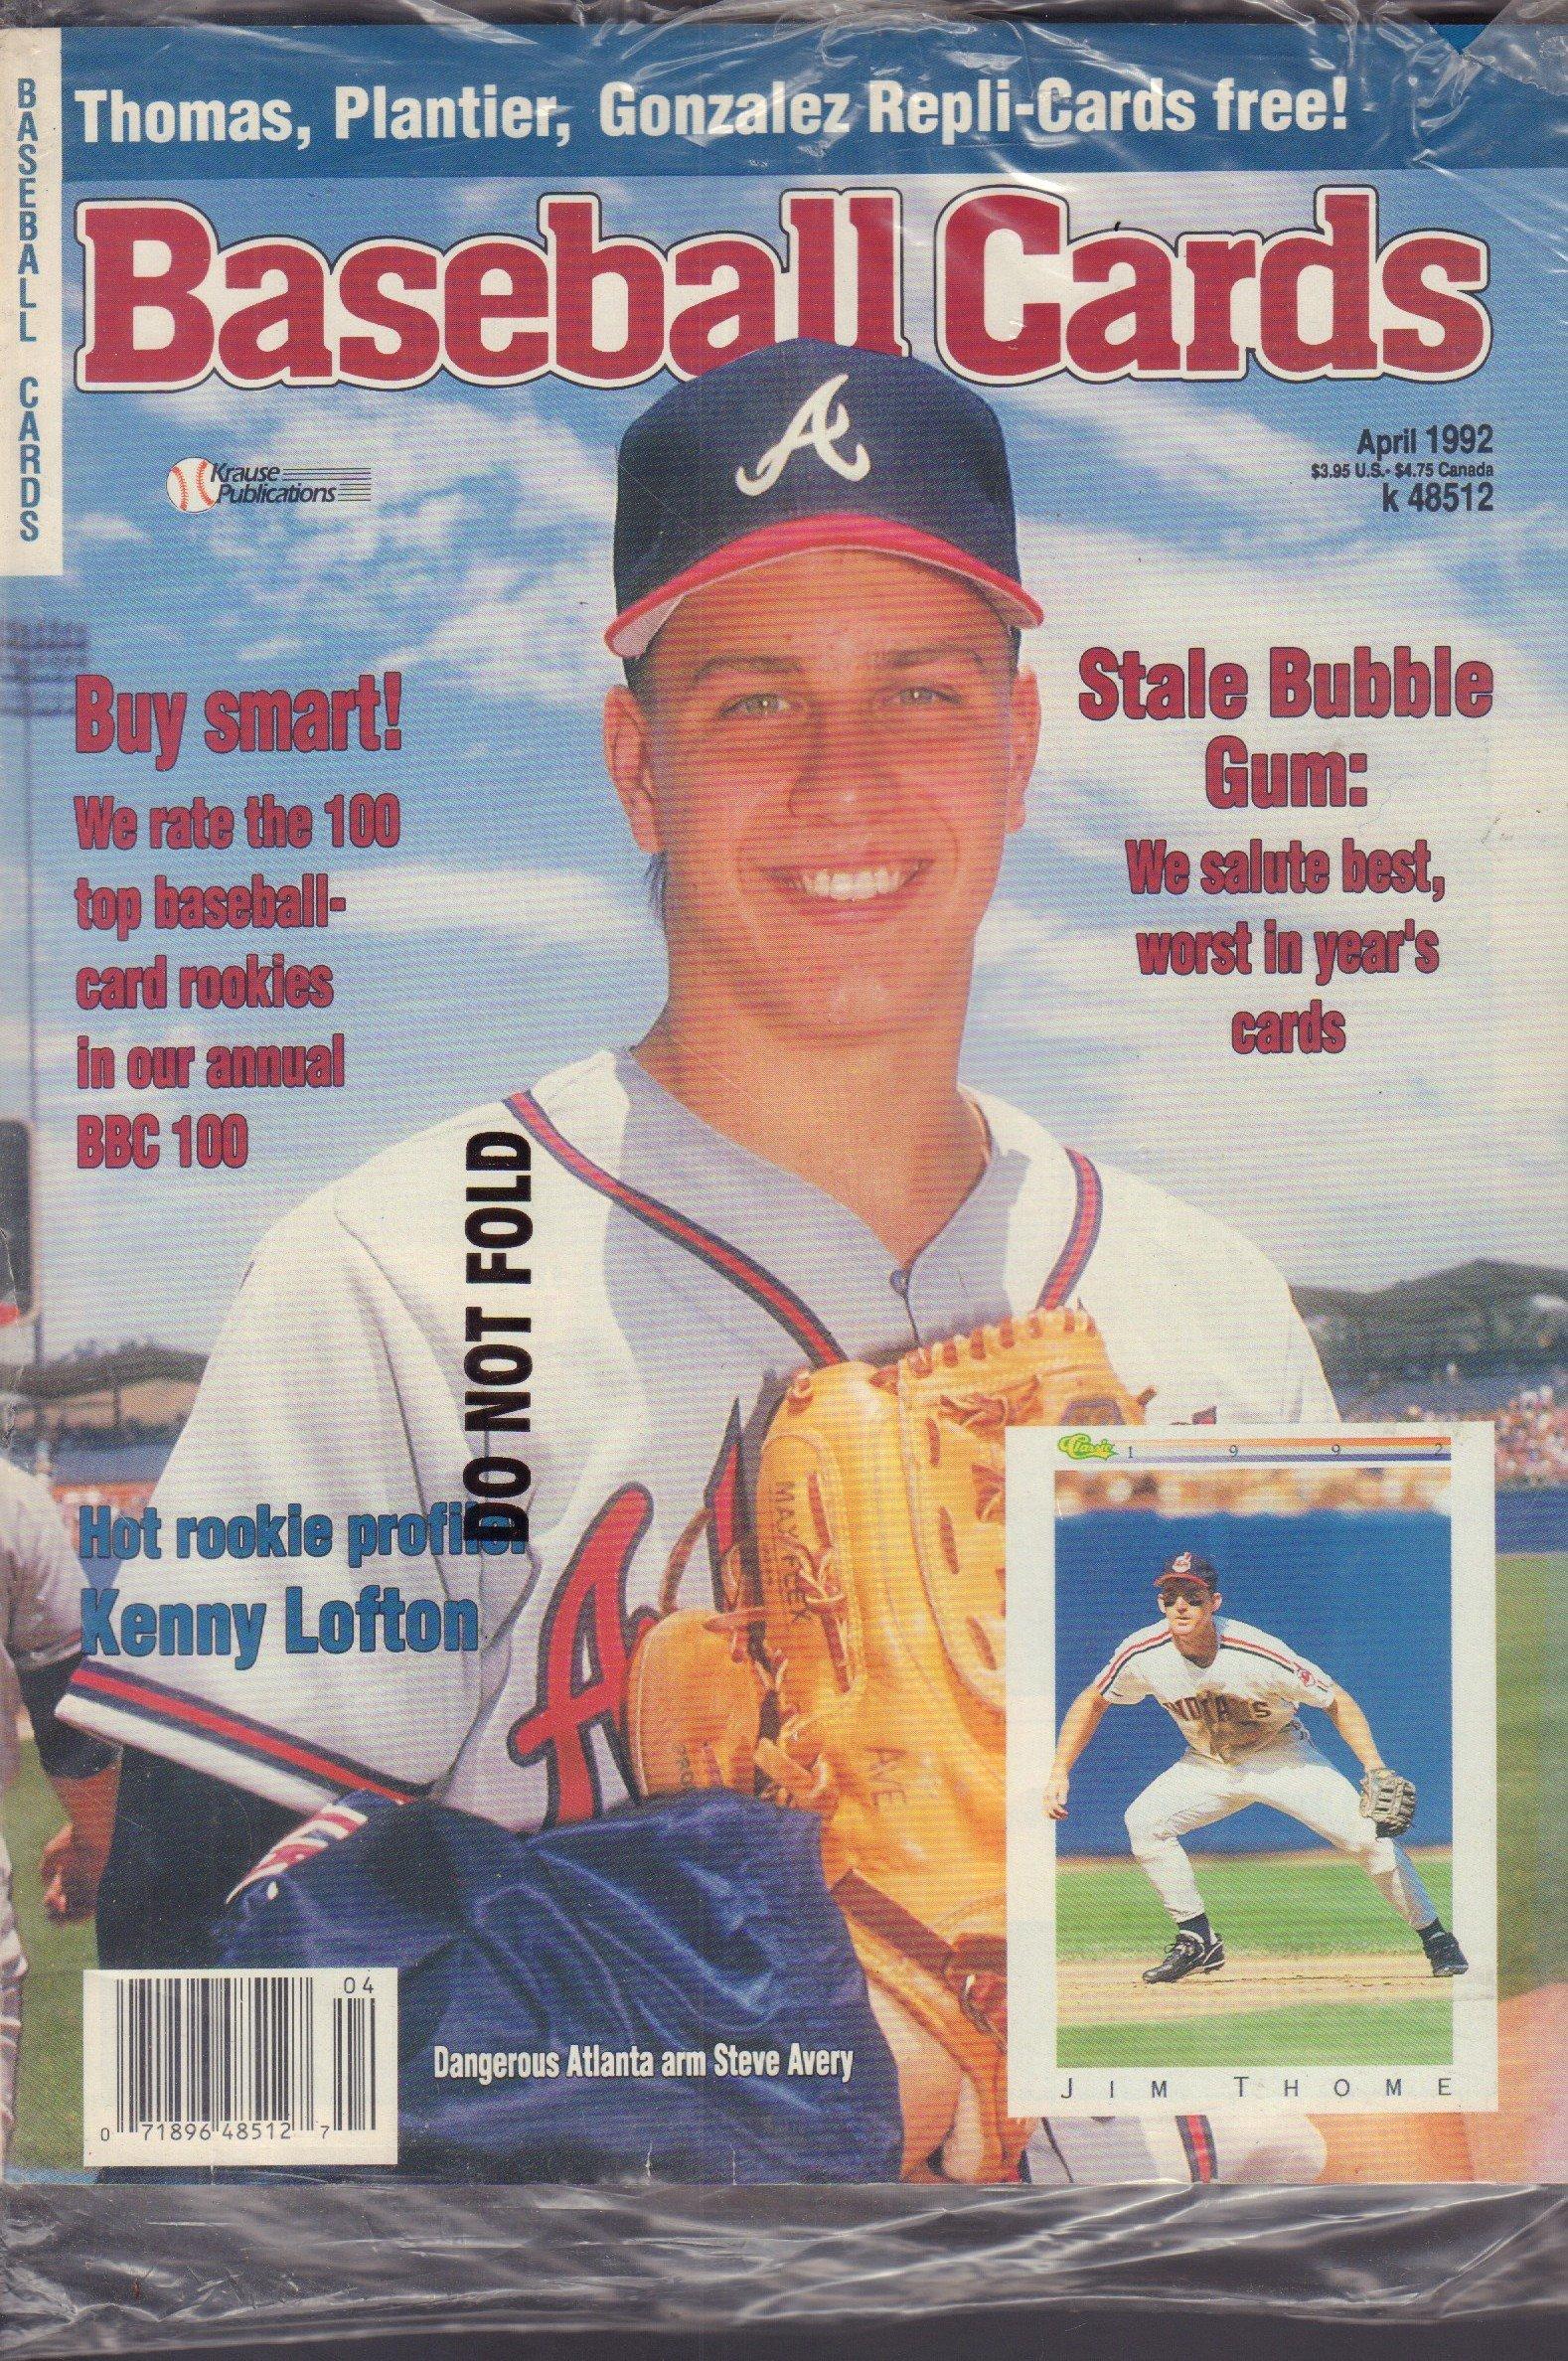 Baseball Cards April 1992 Jim Thome Steve Avery W Cards